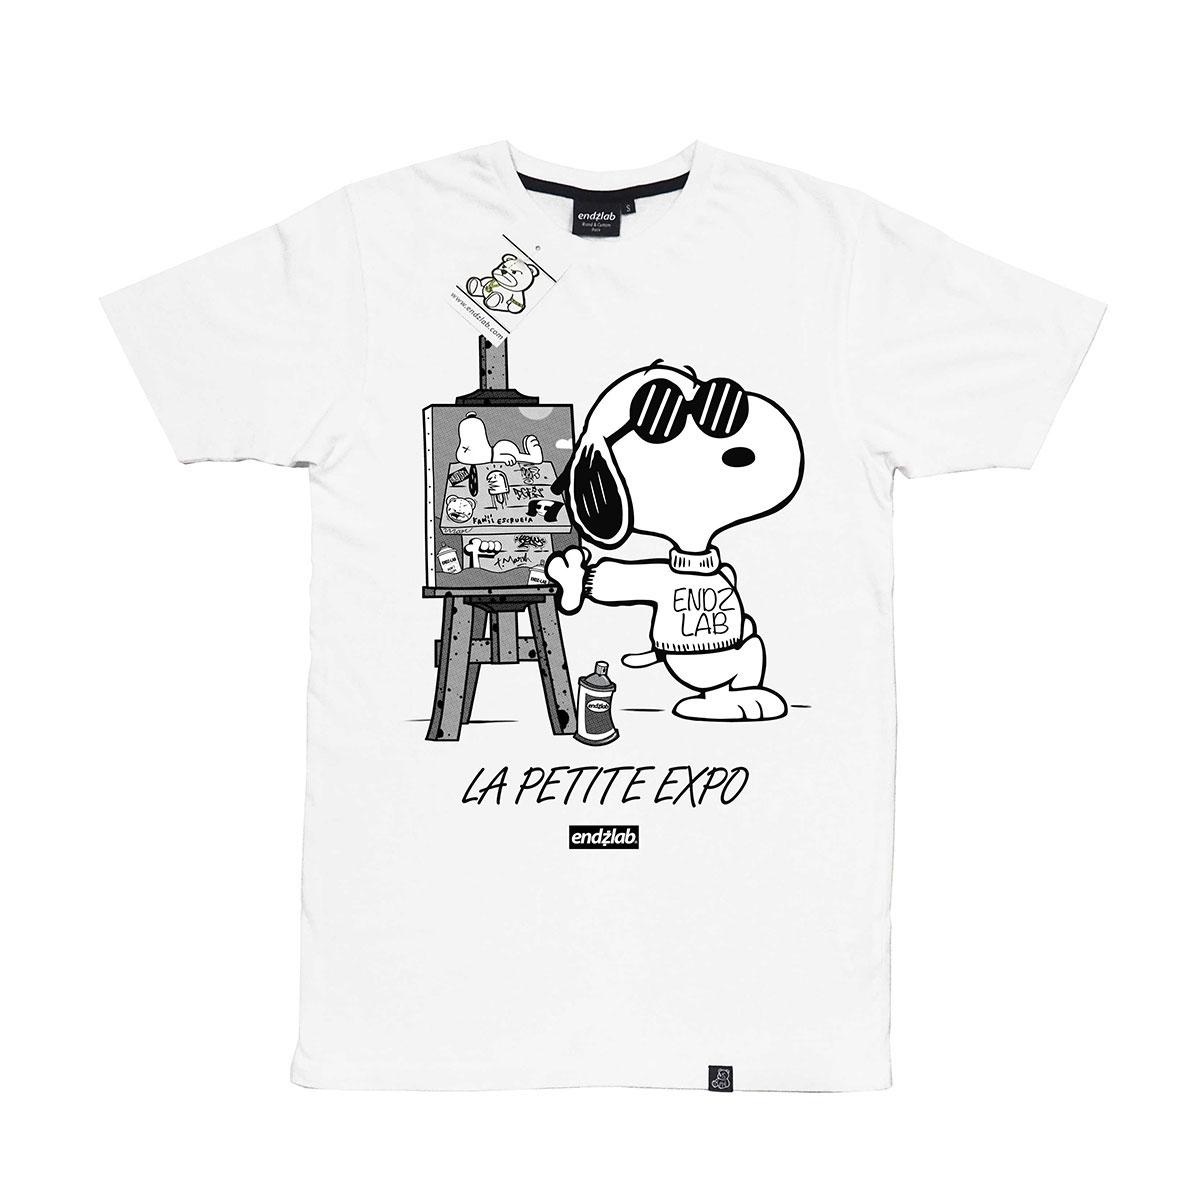 "T-shirt ""La petite expo"" - Endzlab"